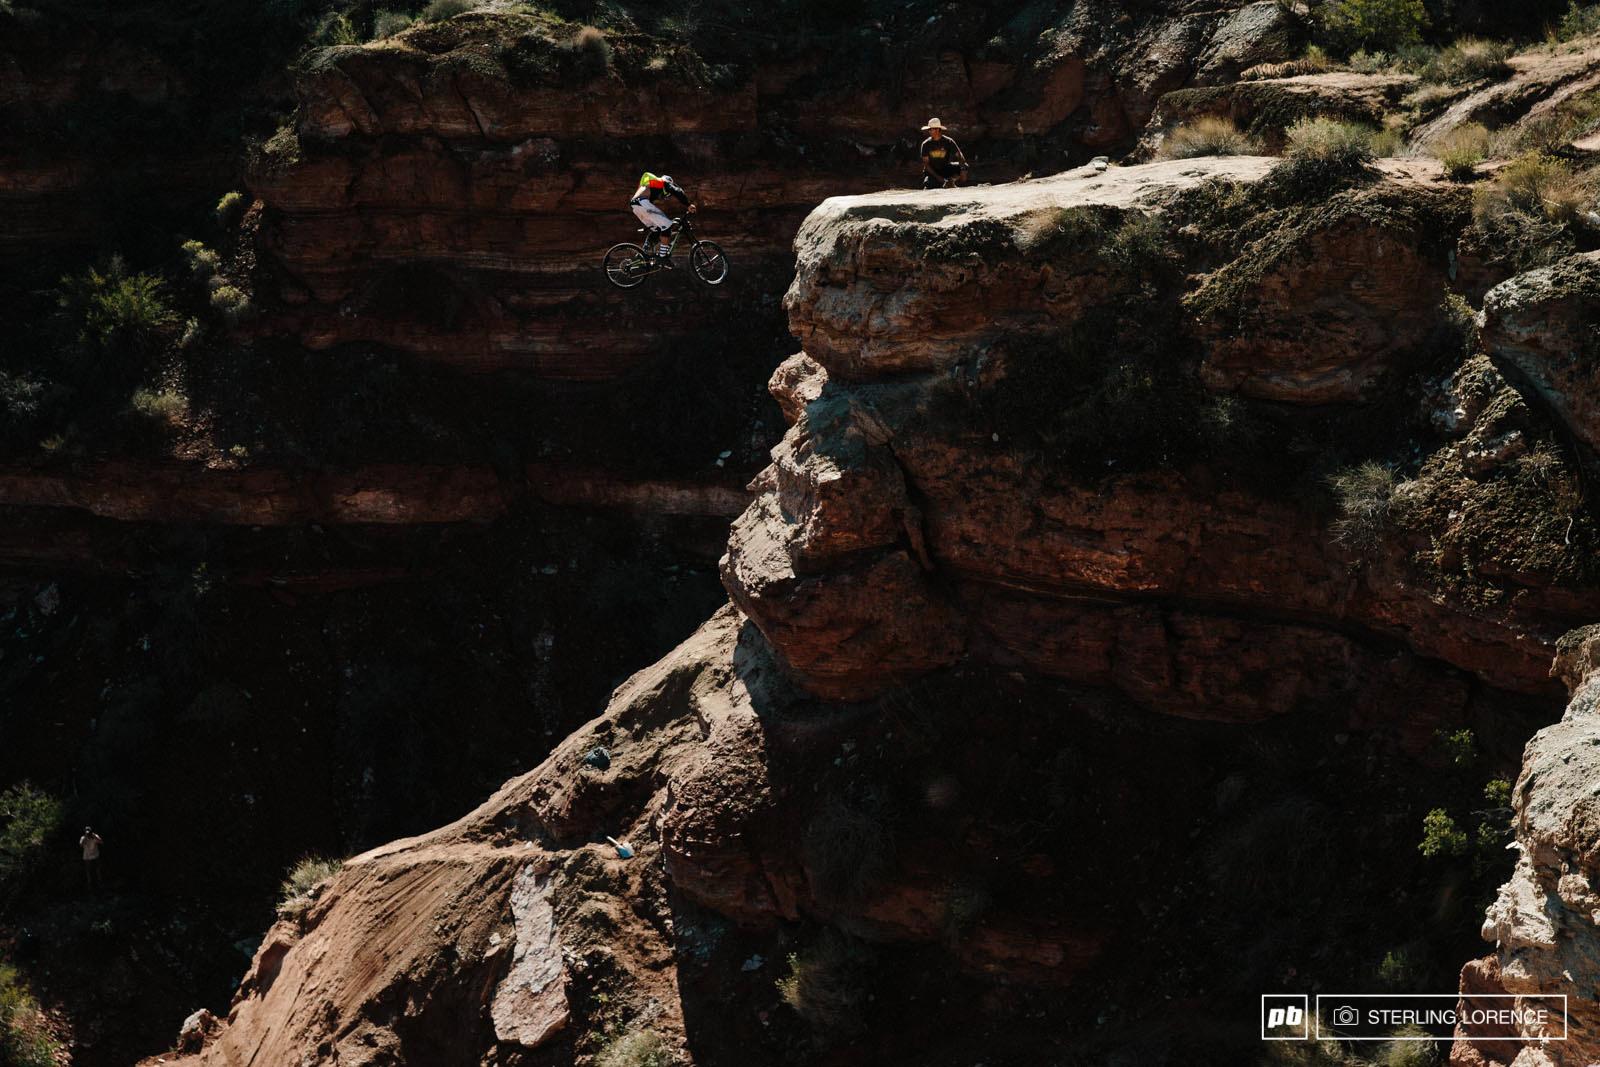 Cam Zink s 360 drop at RedBull Rampage 2014.